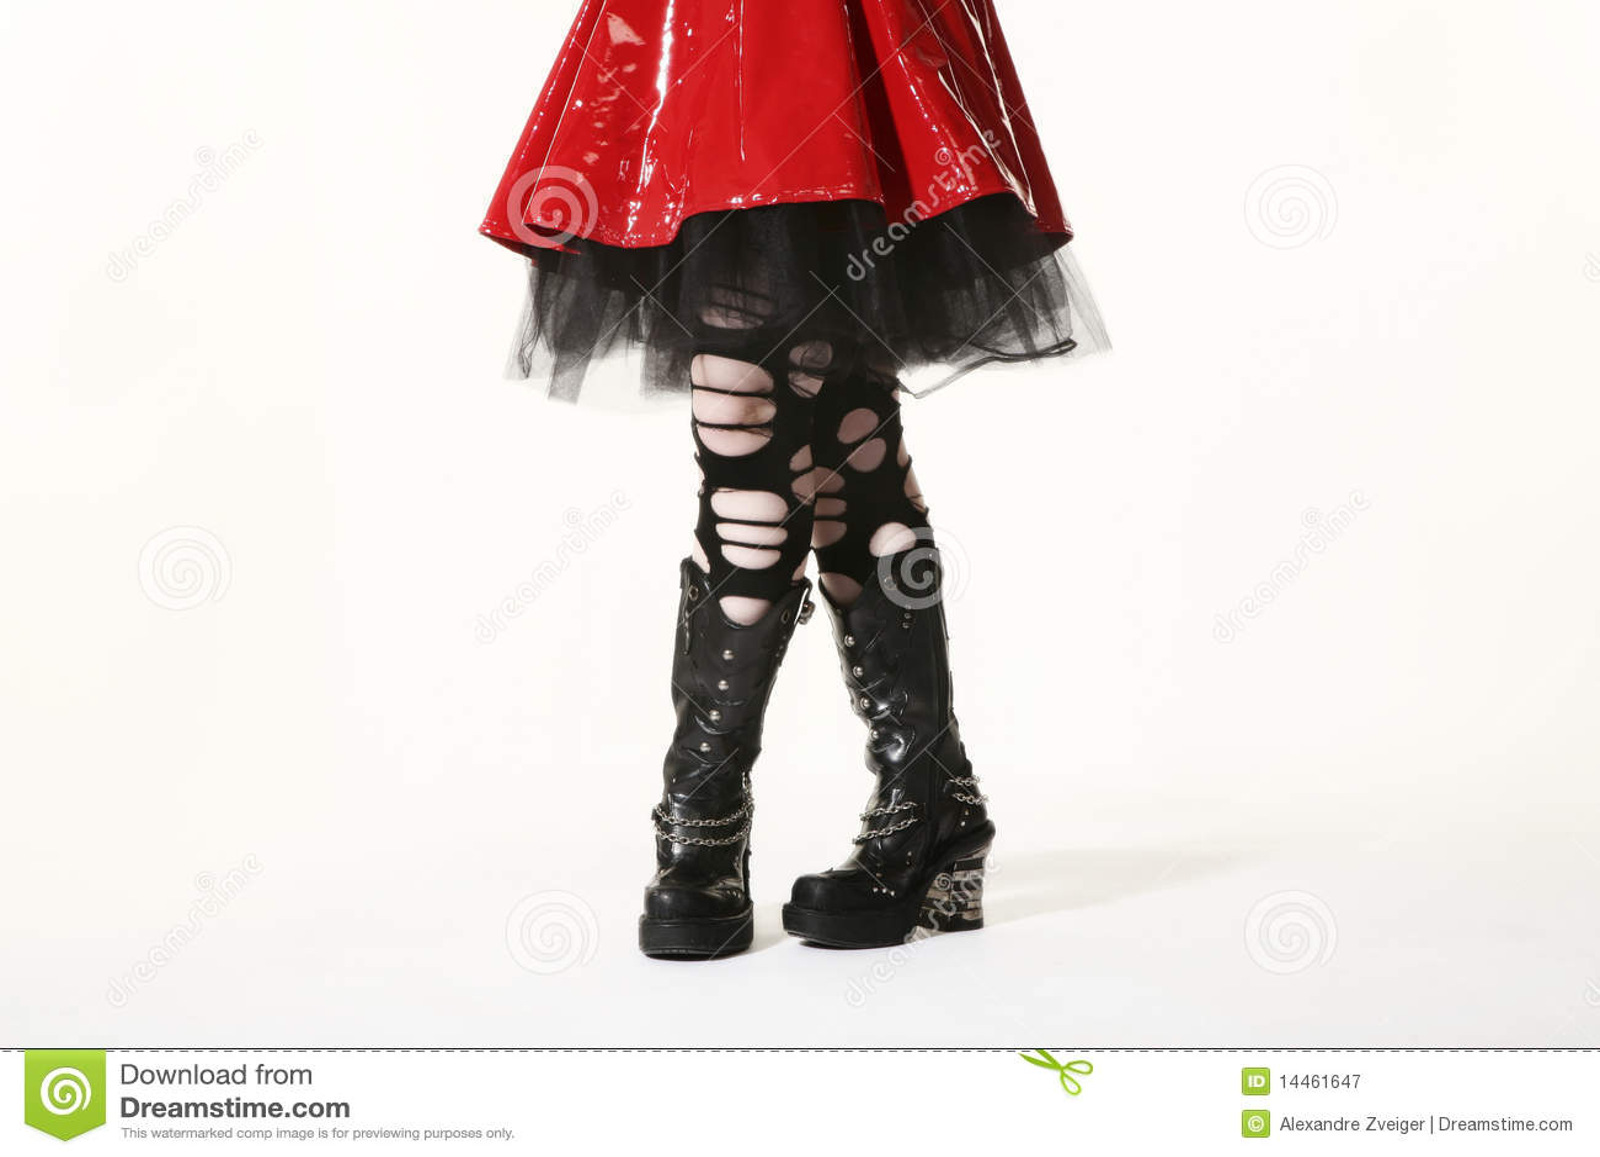 punk fashion wikipedia the free encyclopedia punk fashion